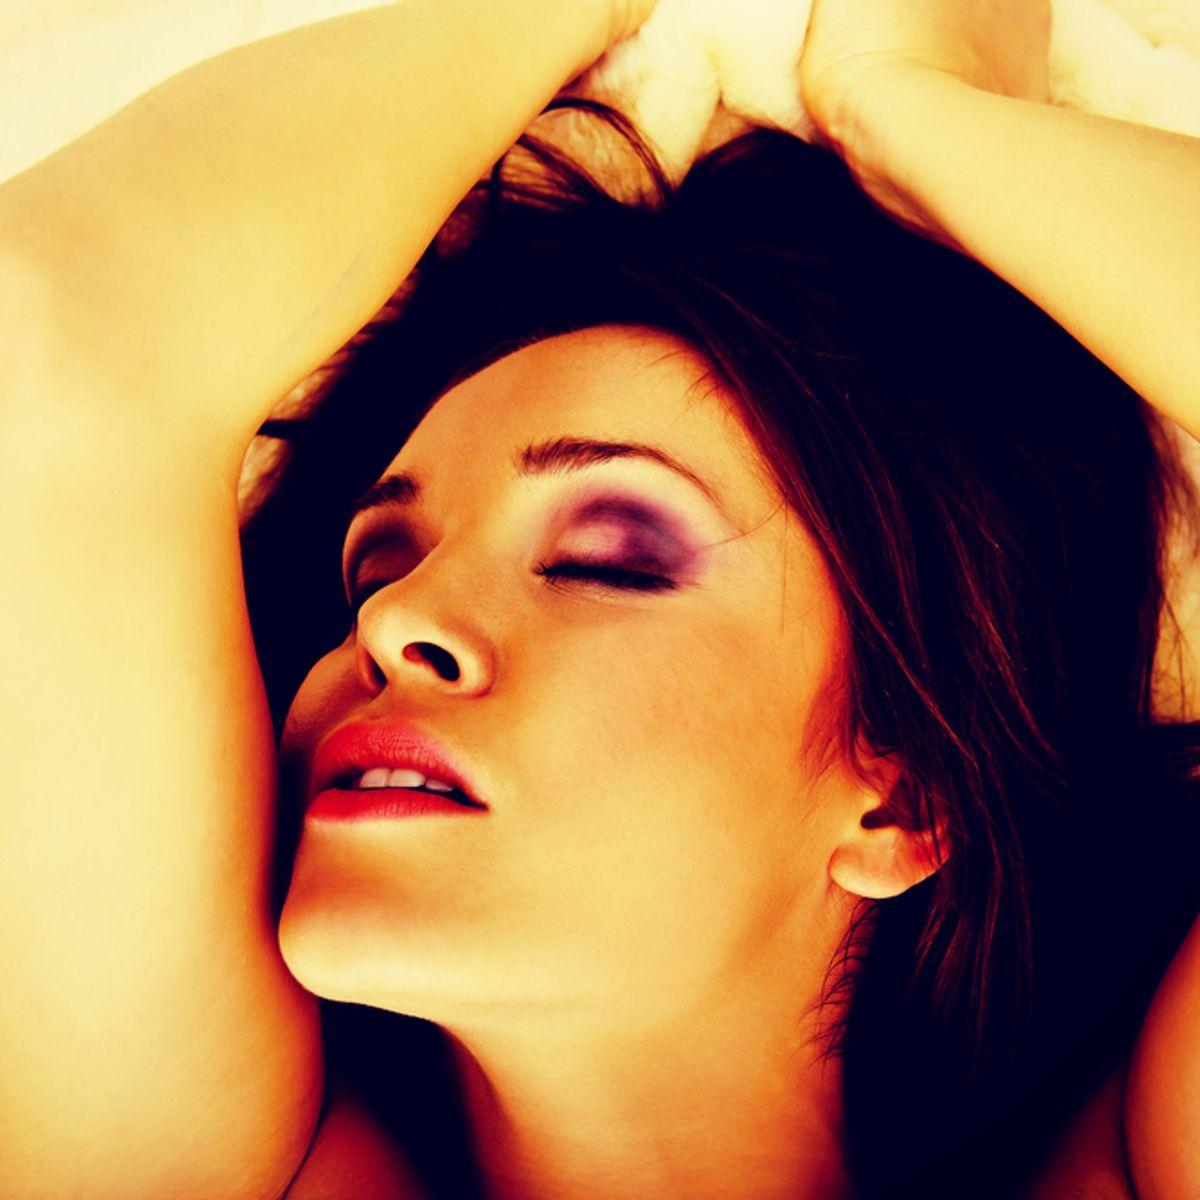 4 Pron Com 4 kinds of pornography women actually masturbate to   salon